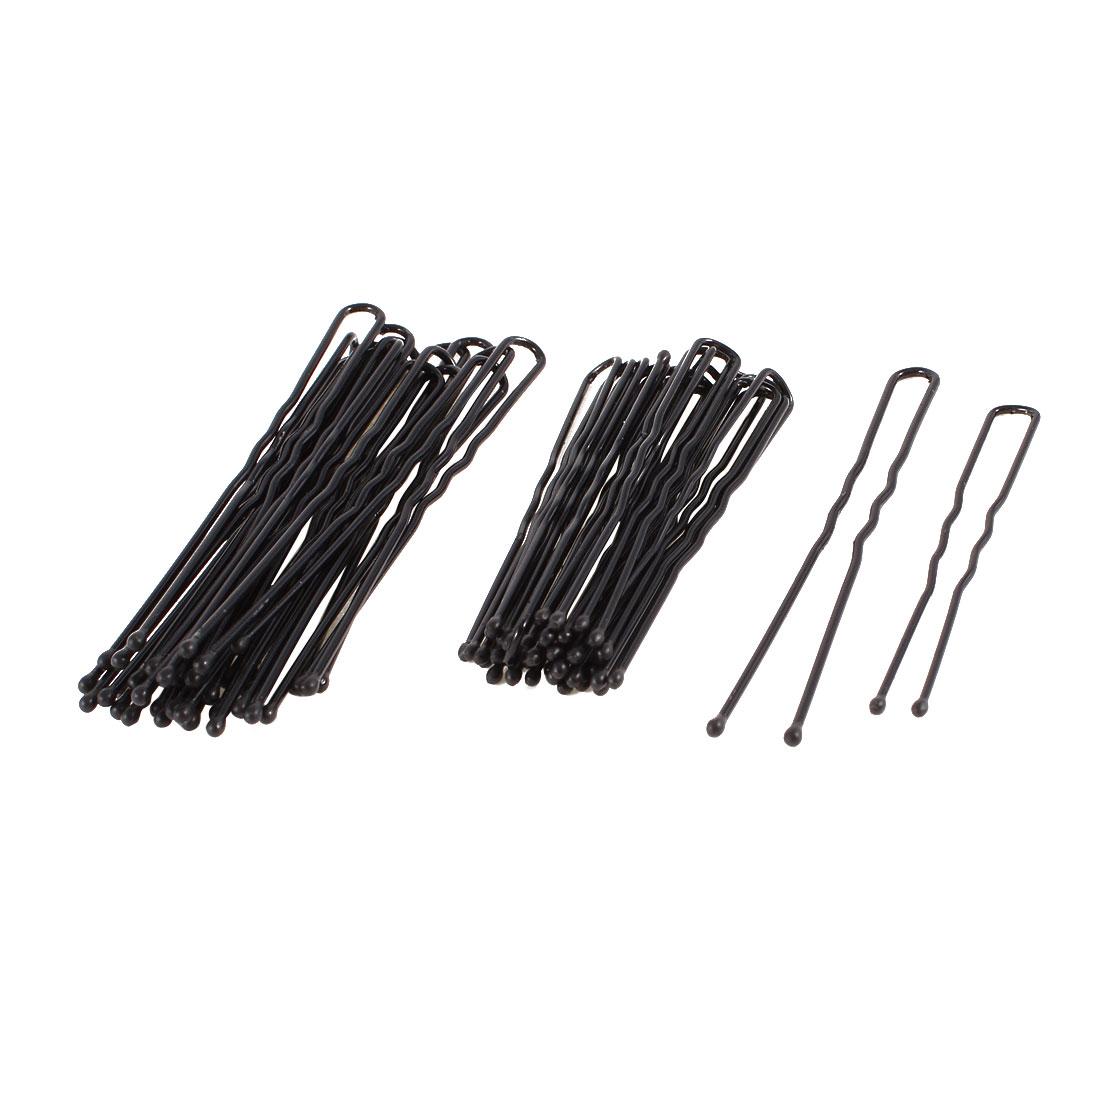 Ladies DIY Hairstyle Black Metal Hair Barrette Bar Clips 40 Pcs